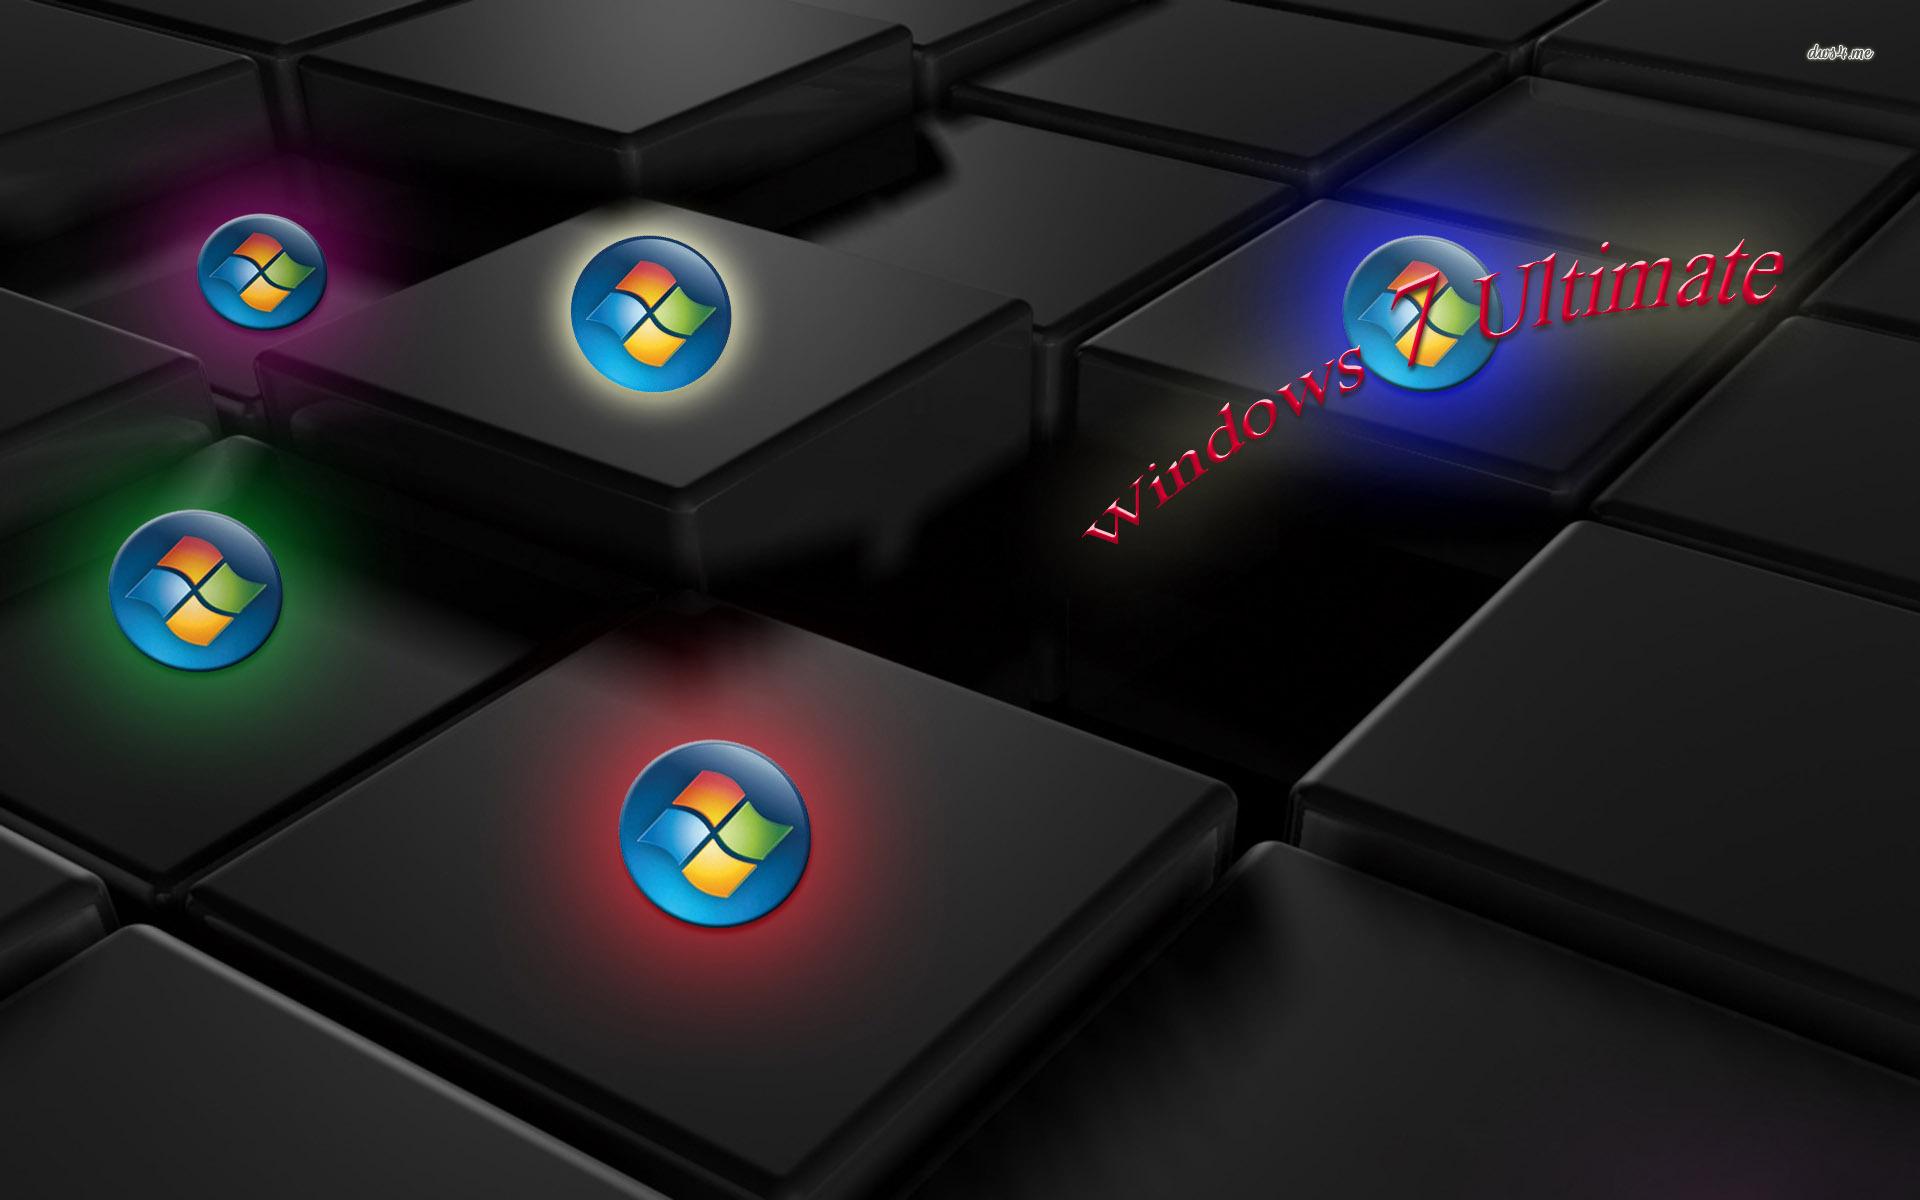 Computers Windows Windows 7 Microsoft Windows 7 Ultimate 1920x1200